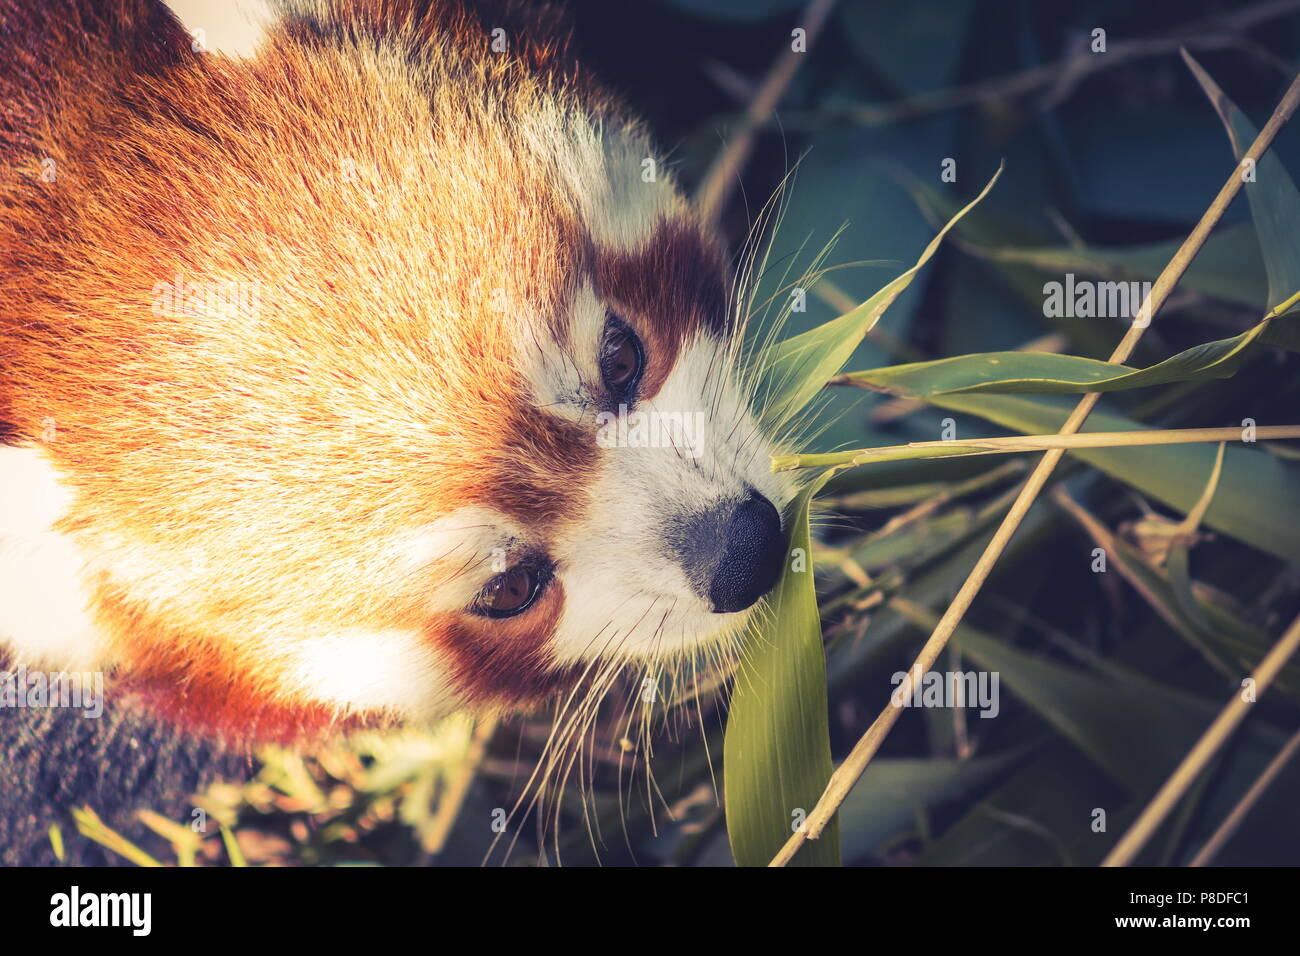 Close up image d'un panda rouge (Ailurus fulgens) with copy space Photo Stock